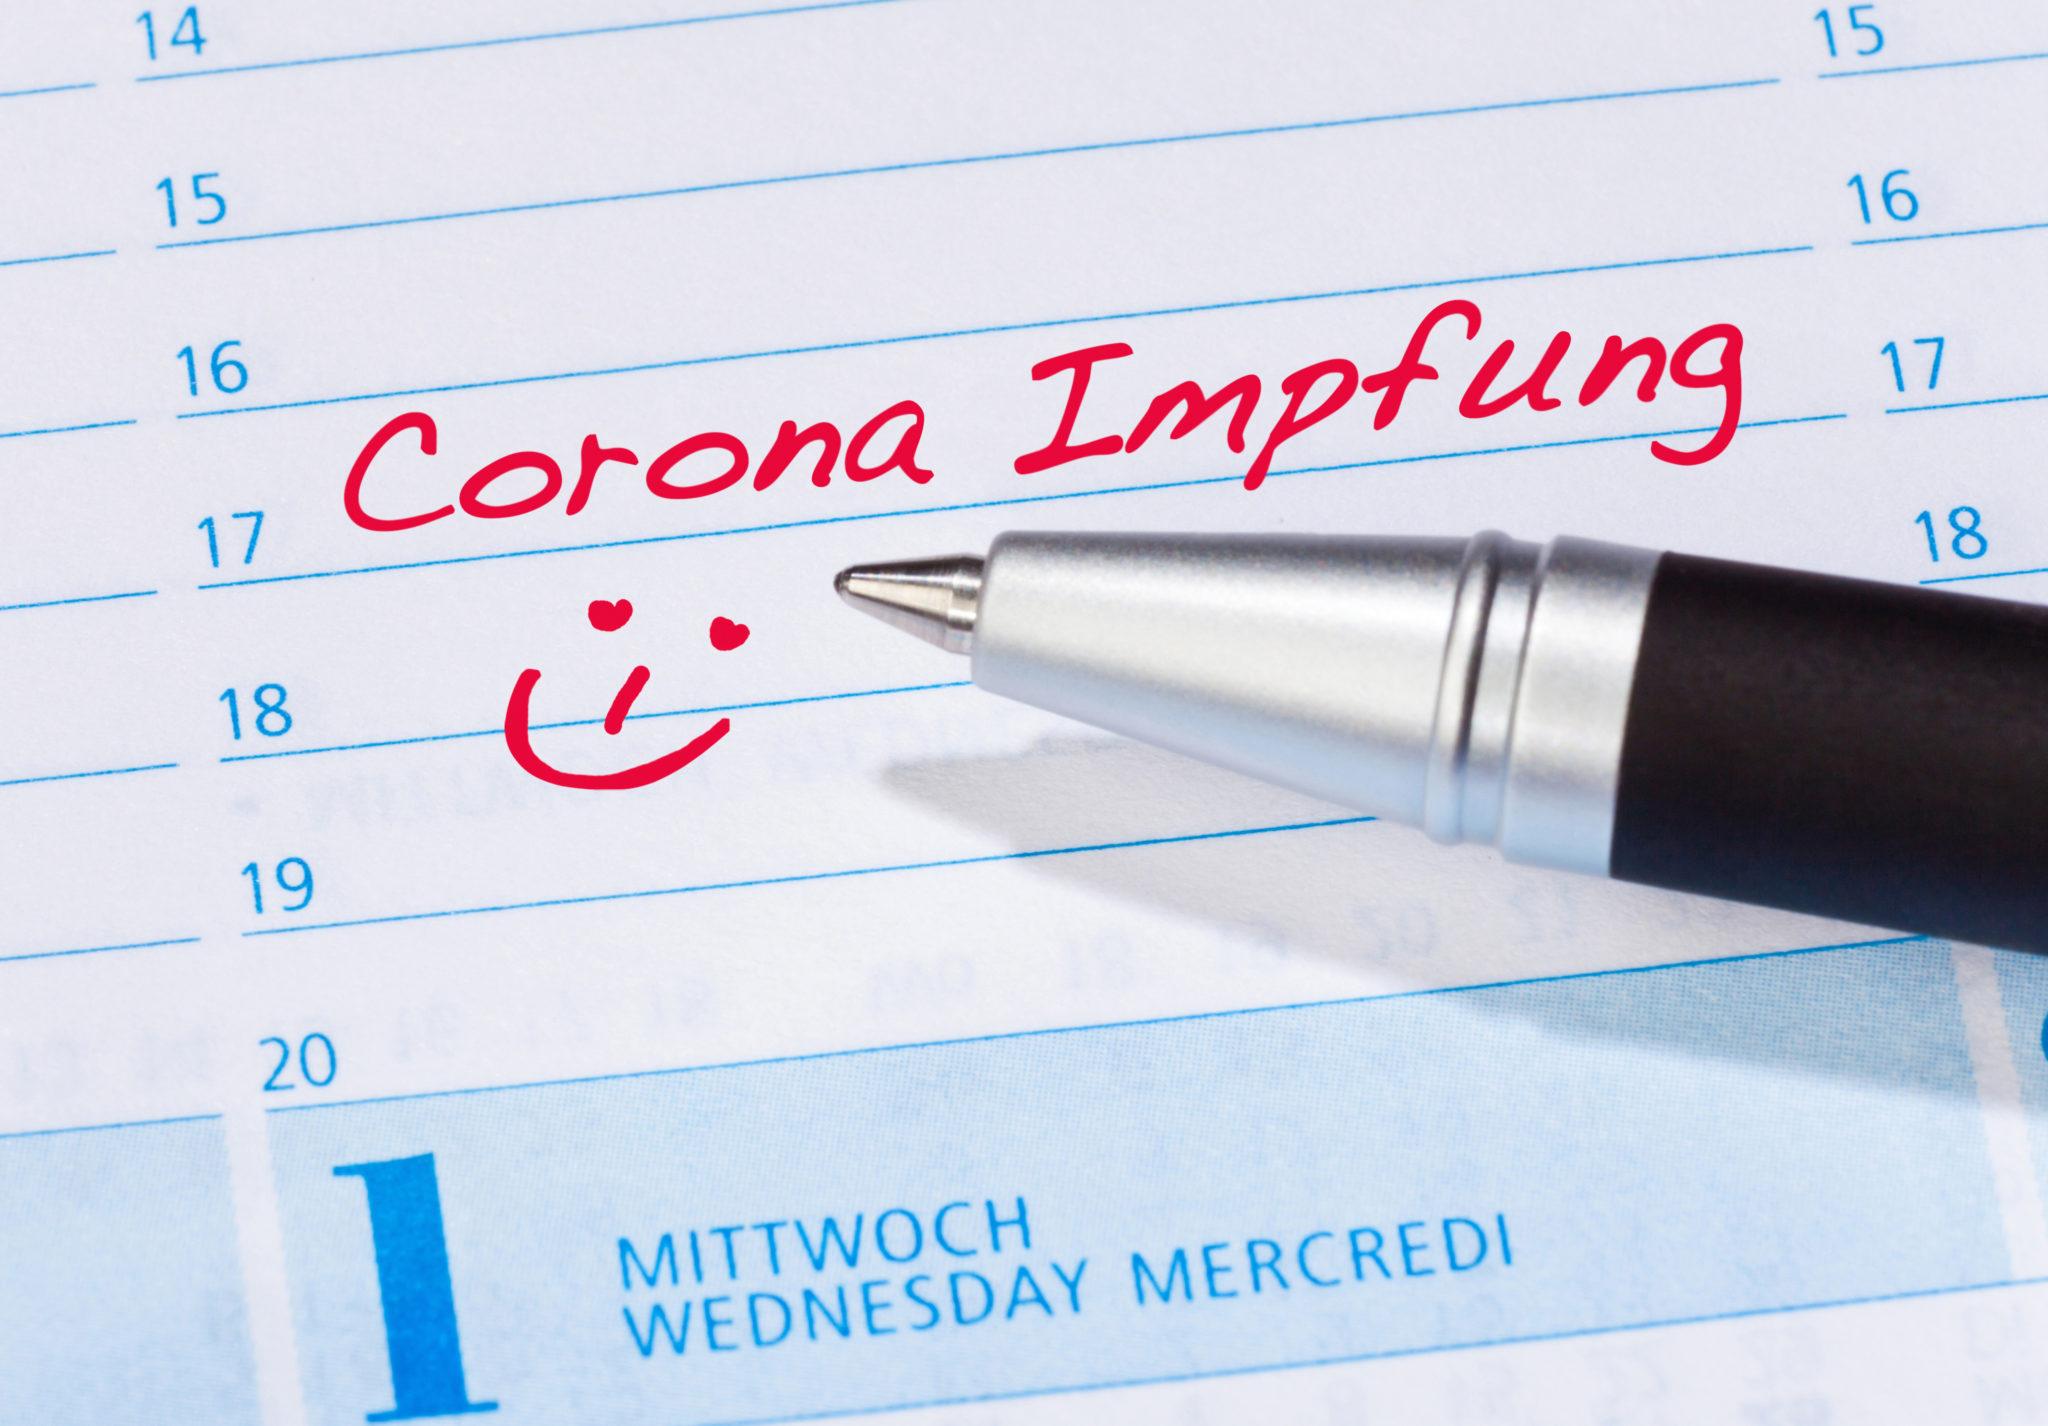 Corona-Impfung vermerkt im Terminkalender